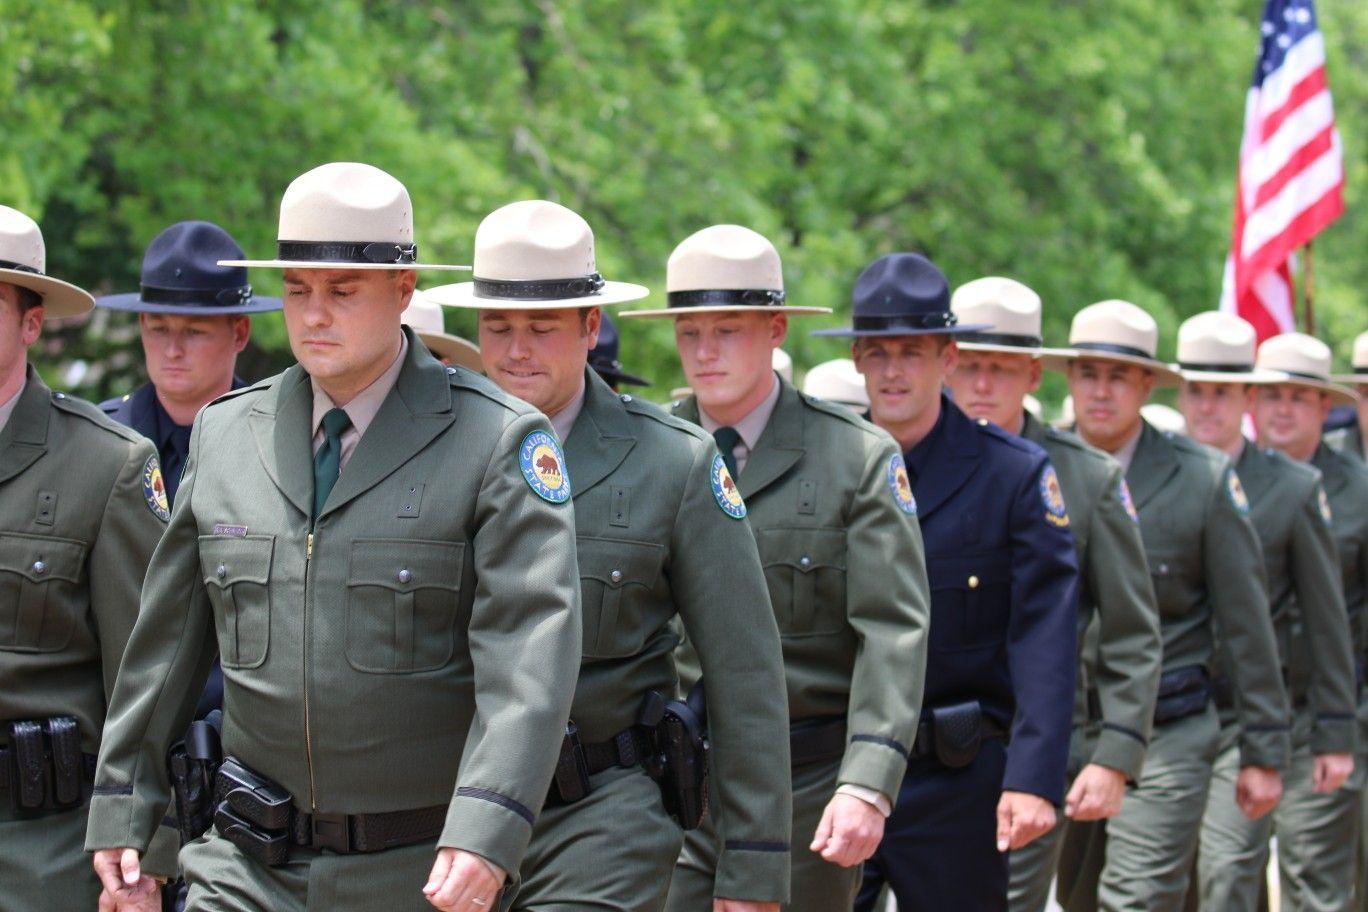 State Park Ranger Academy Graduation Park Ranger Us Park State Parks